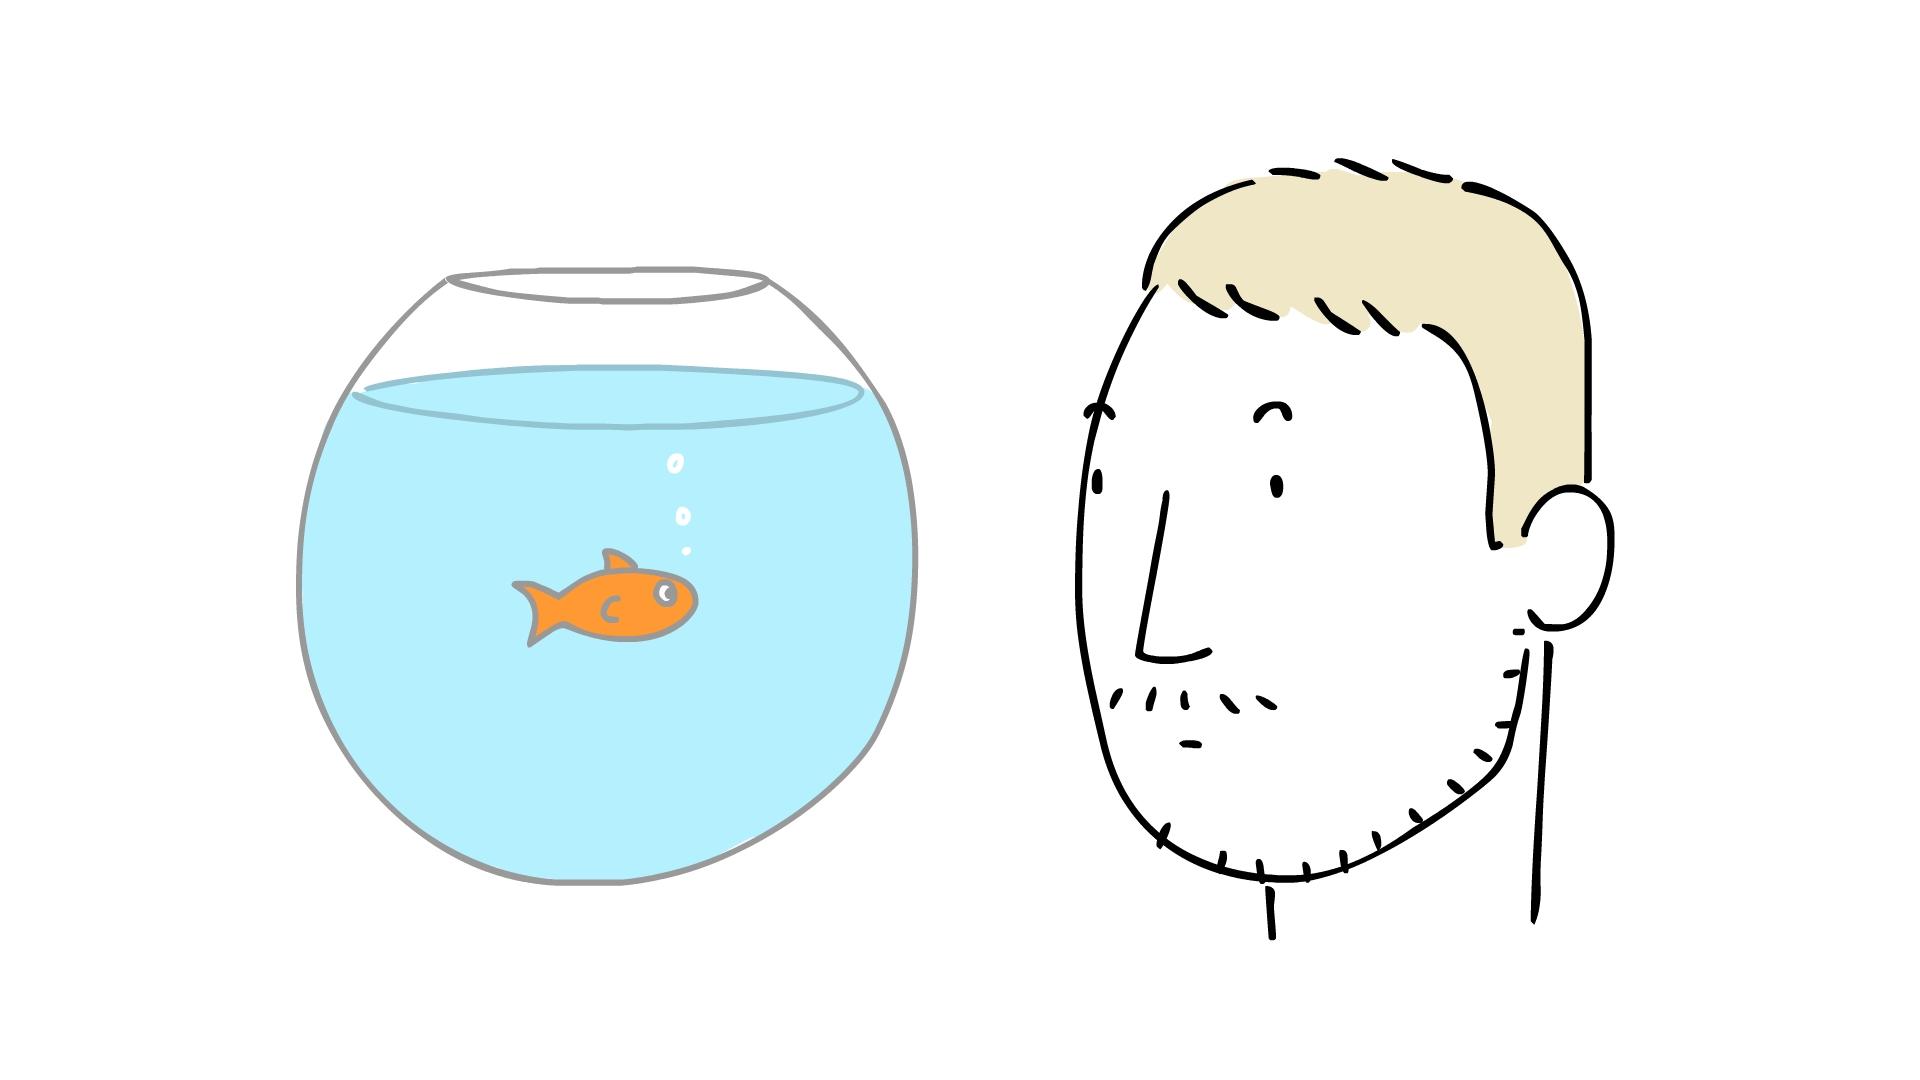 glued-dad-fishbowl.jpg